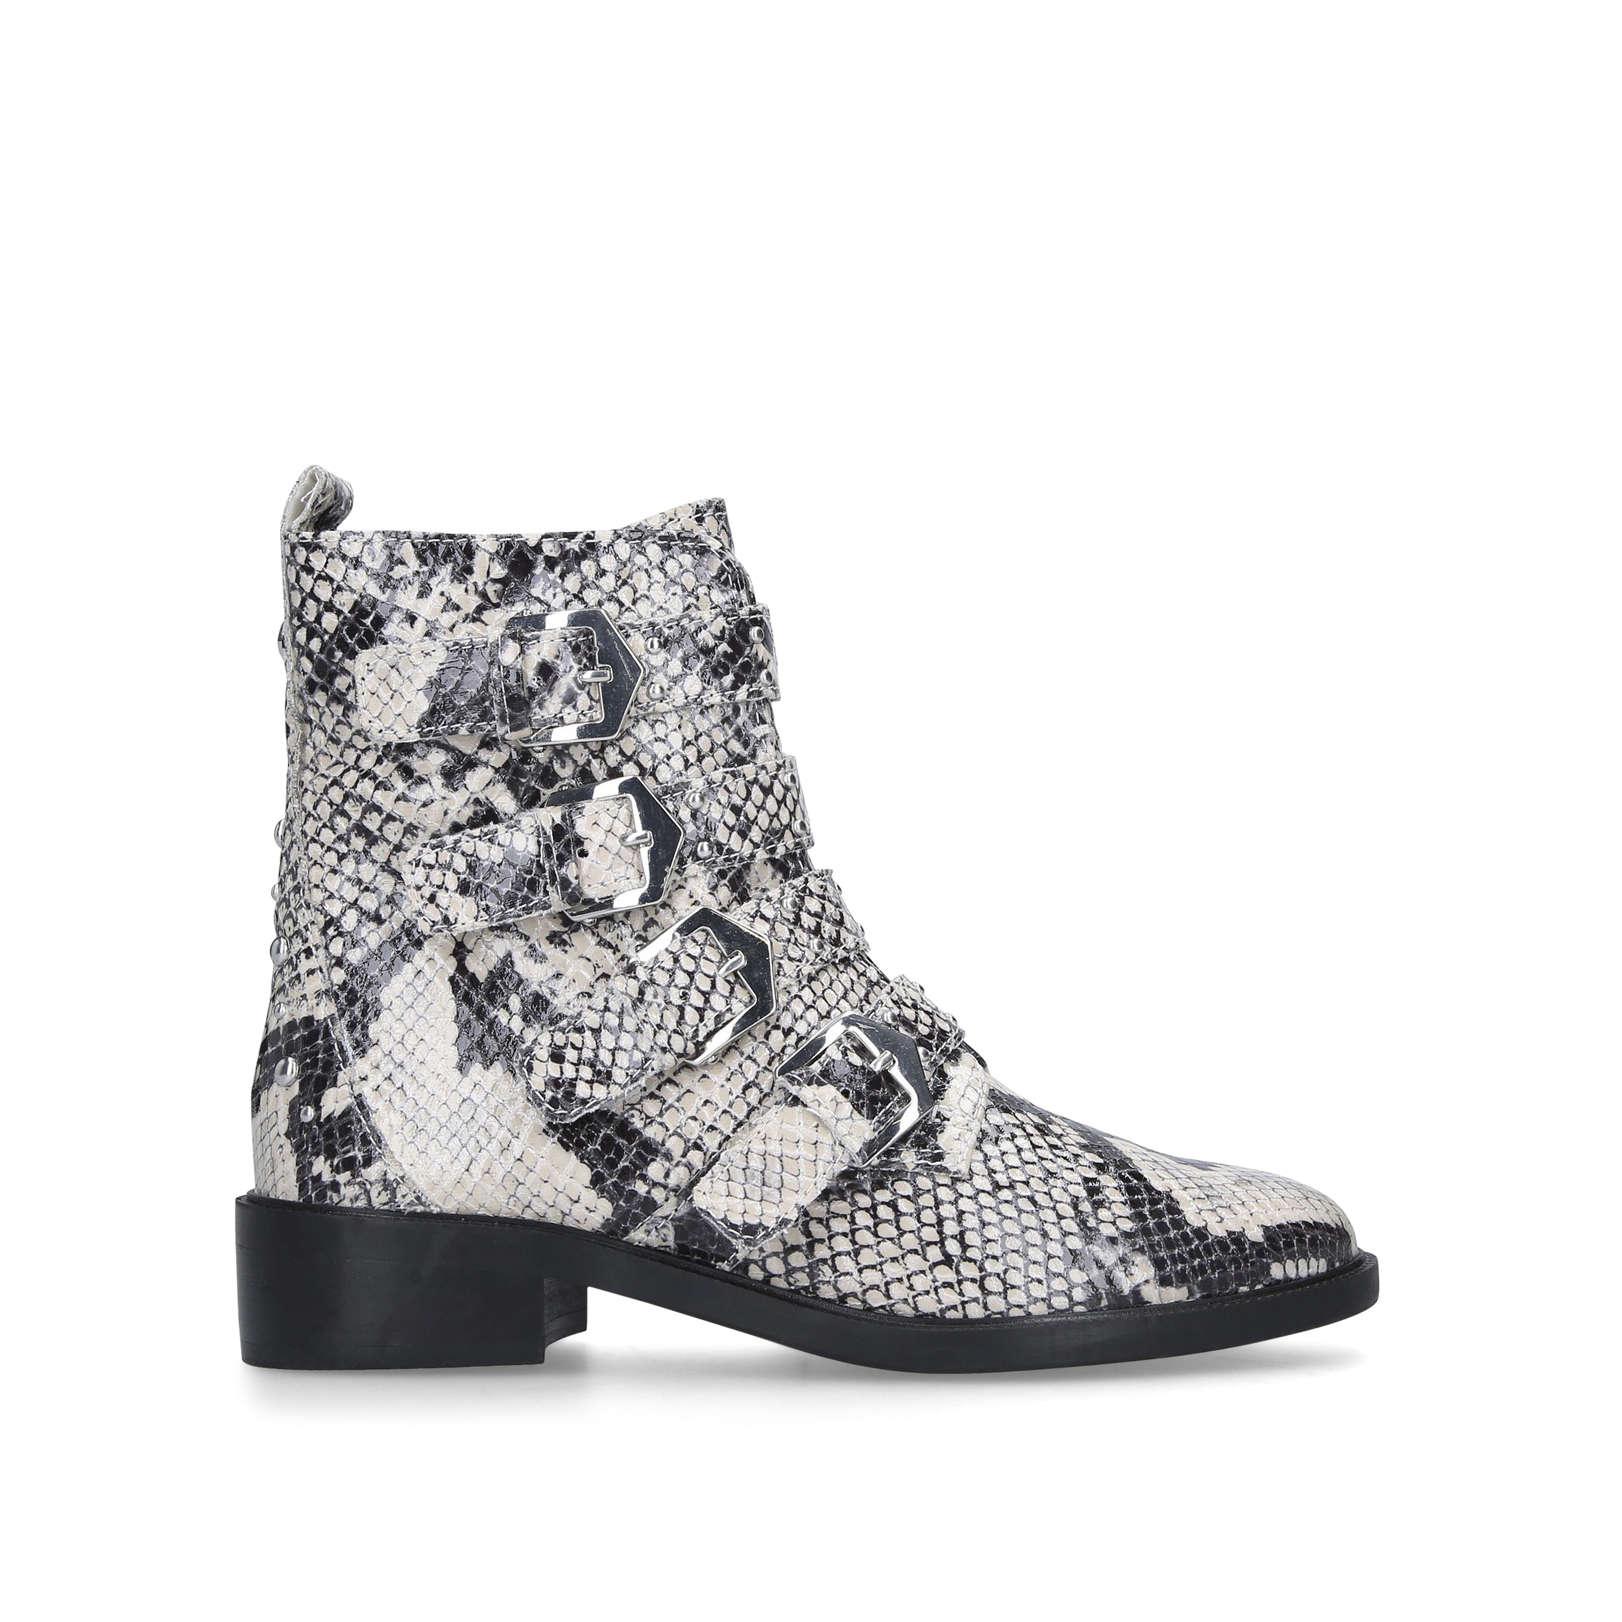 SCANT - CARVELA Ankle Boots